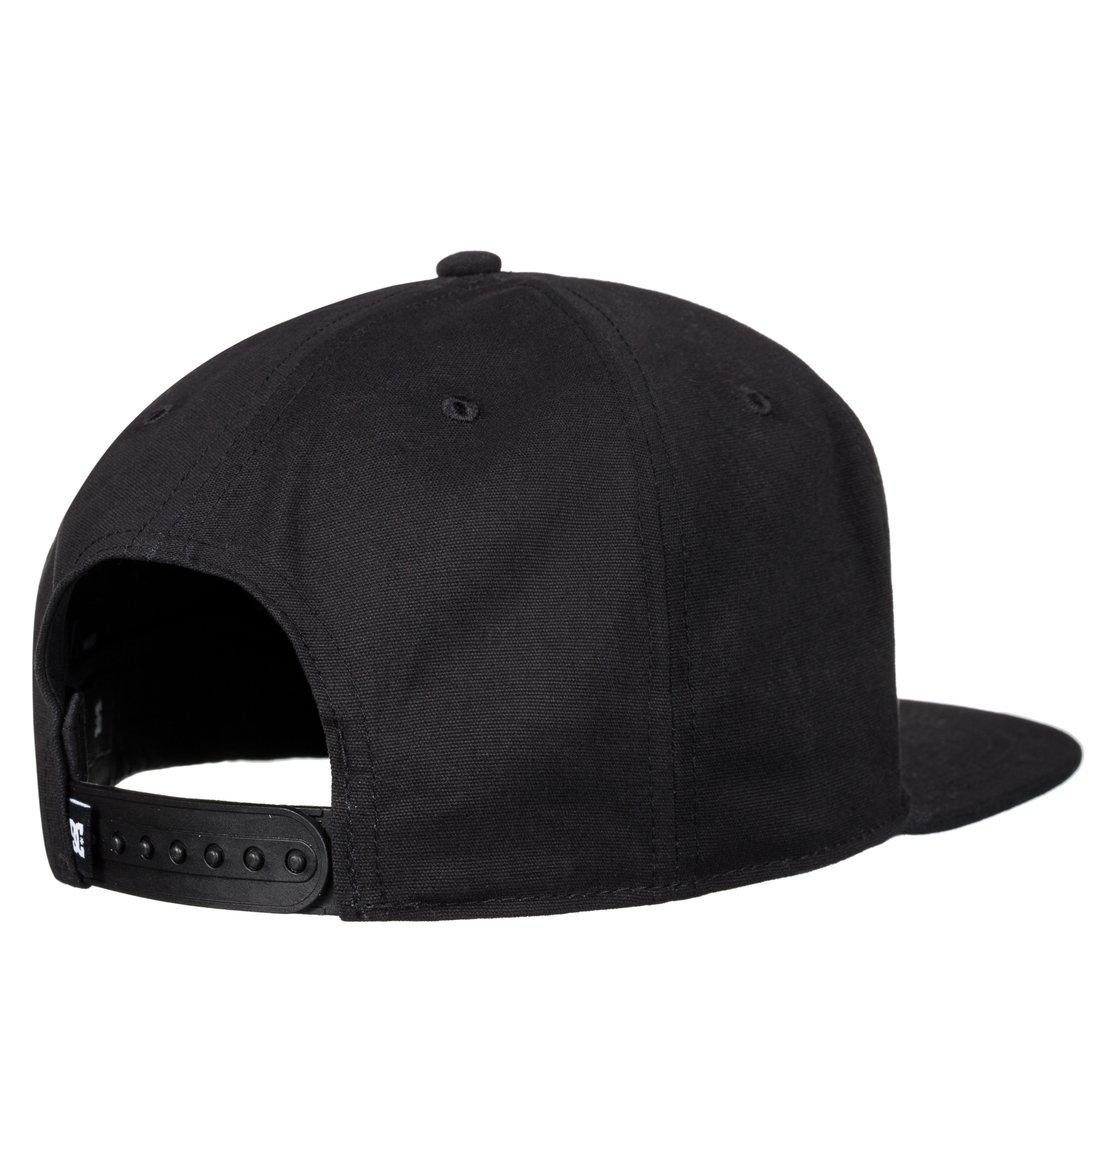 DC Shoes Men's Proceeder Snapback Hat Black 2TmSi